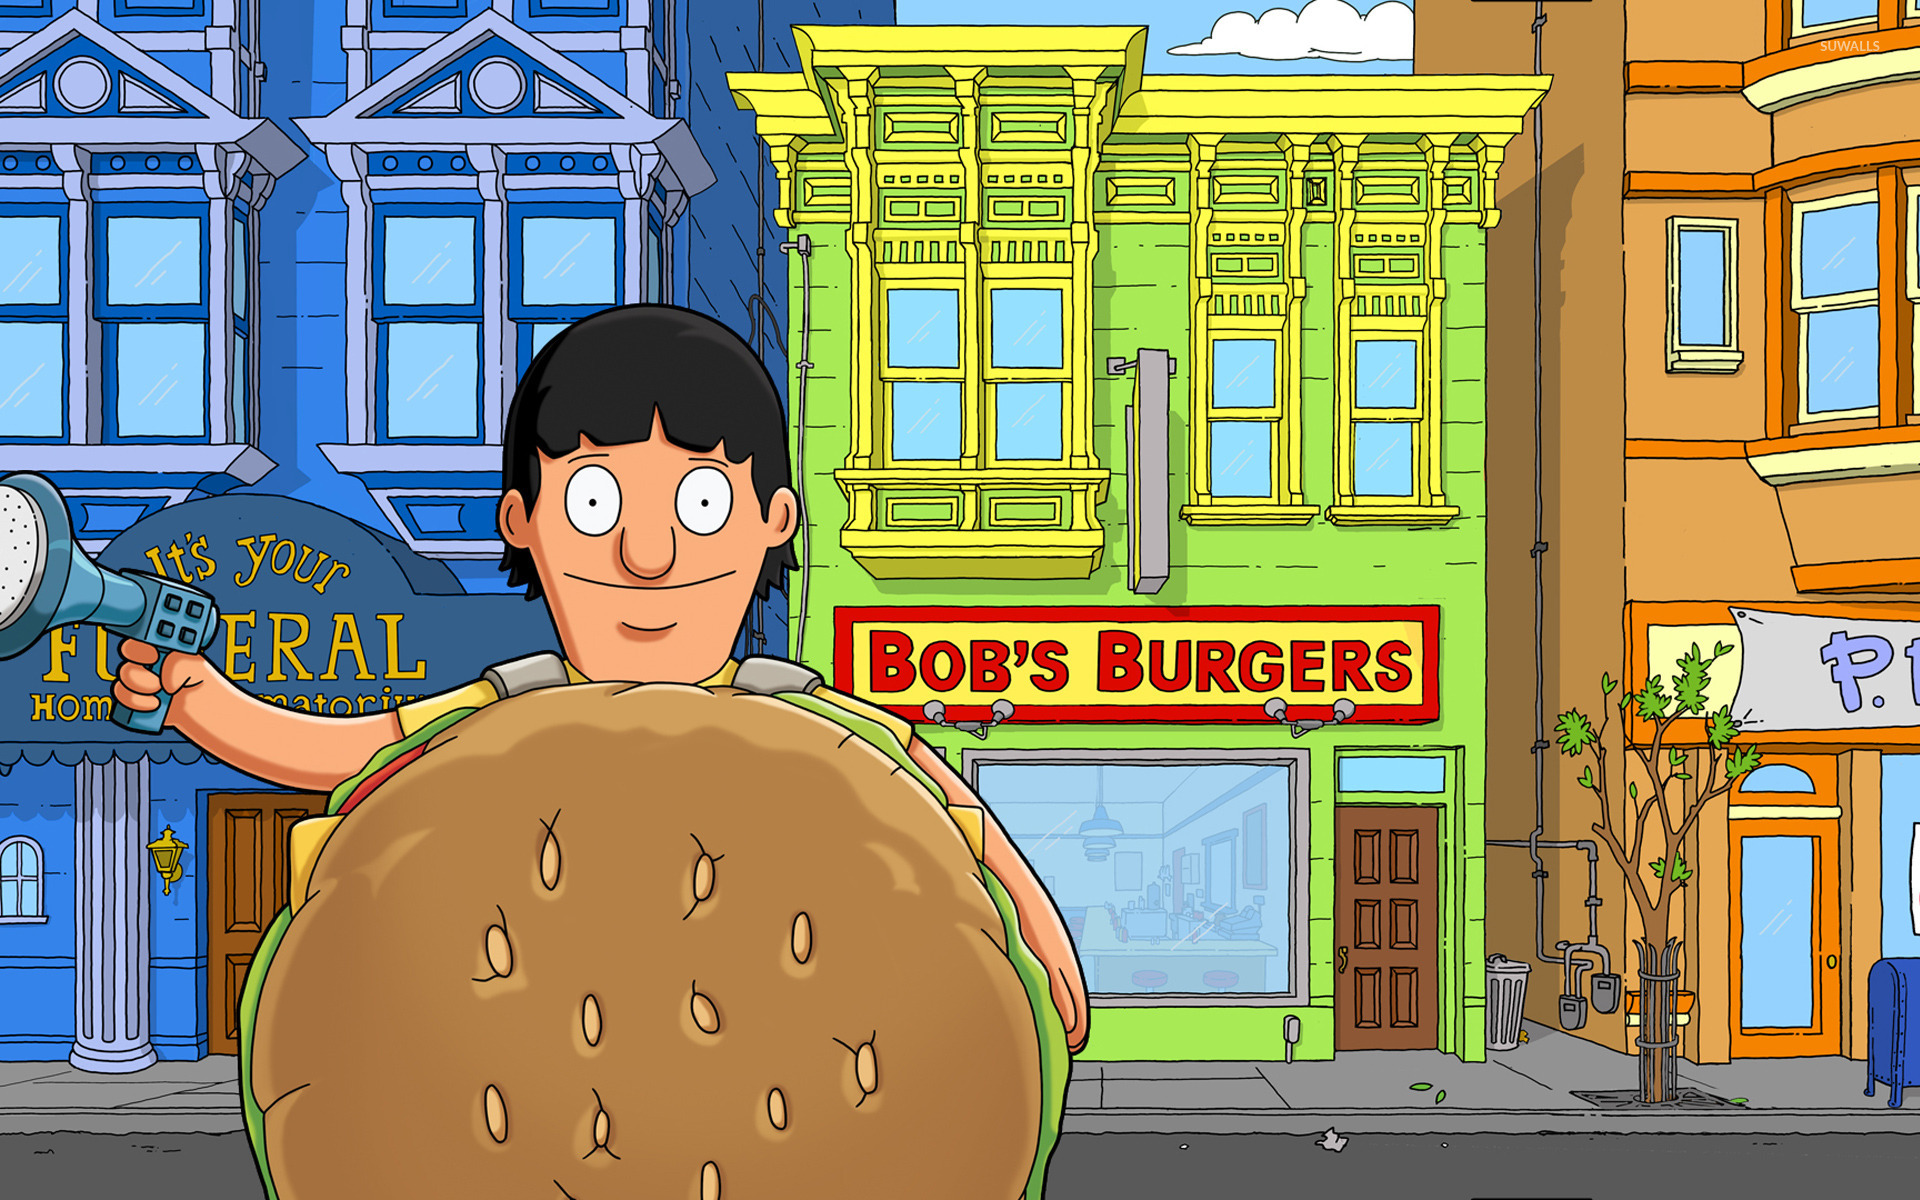 Bob S Burgers Wallpapers Ari Rachel Wallpaper